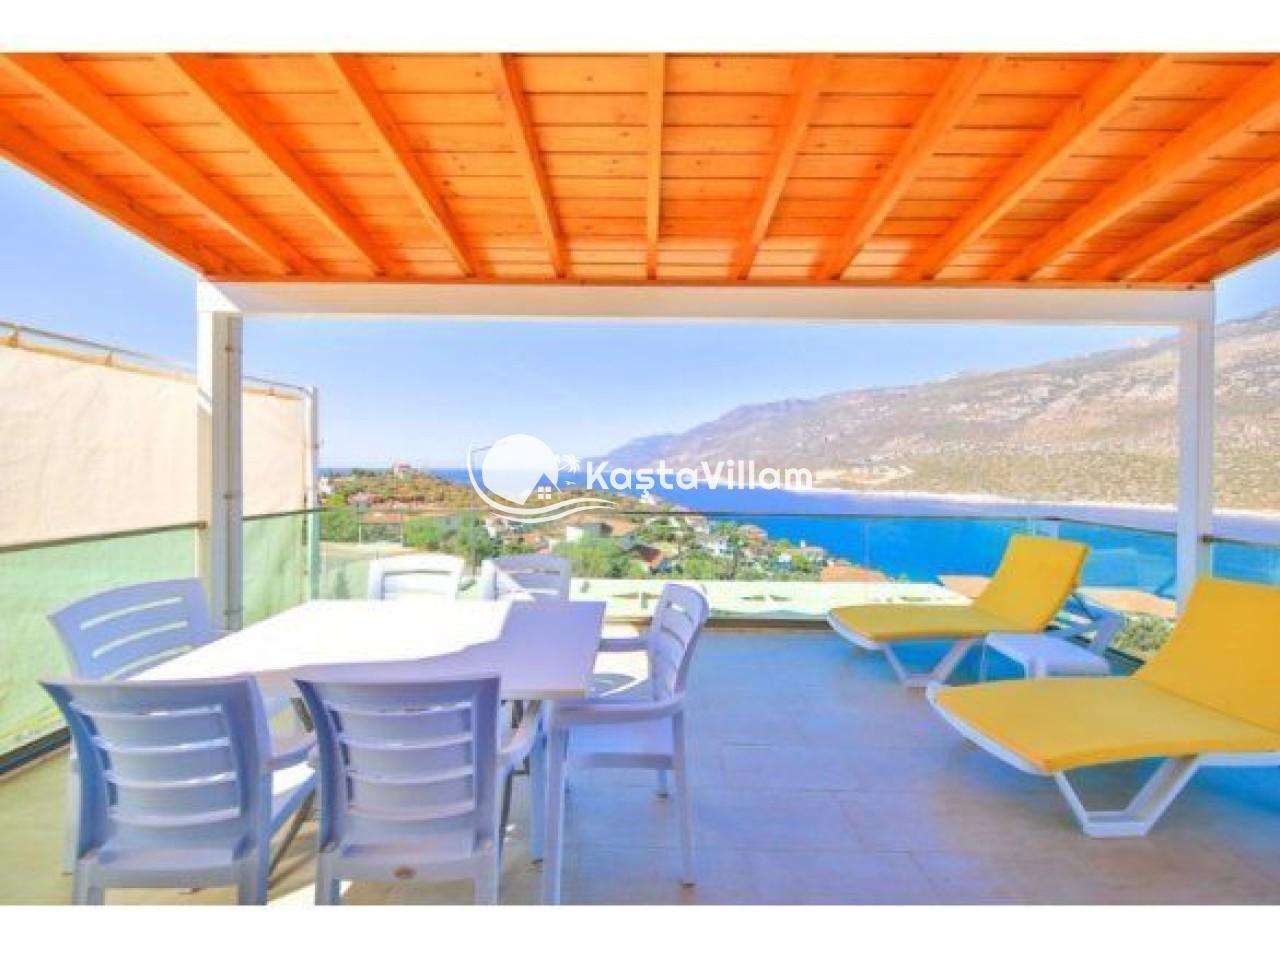 Kaş kiralık villa / Villa James 2 - Kaştavillam